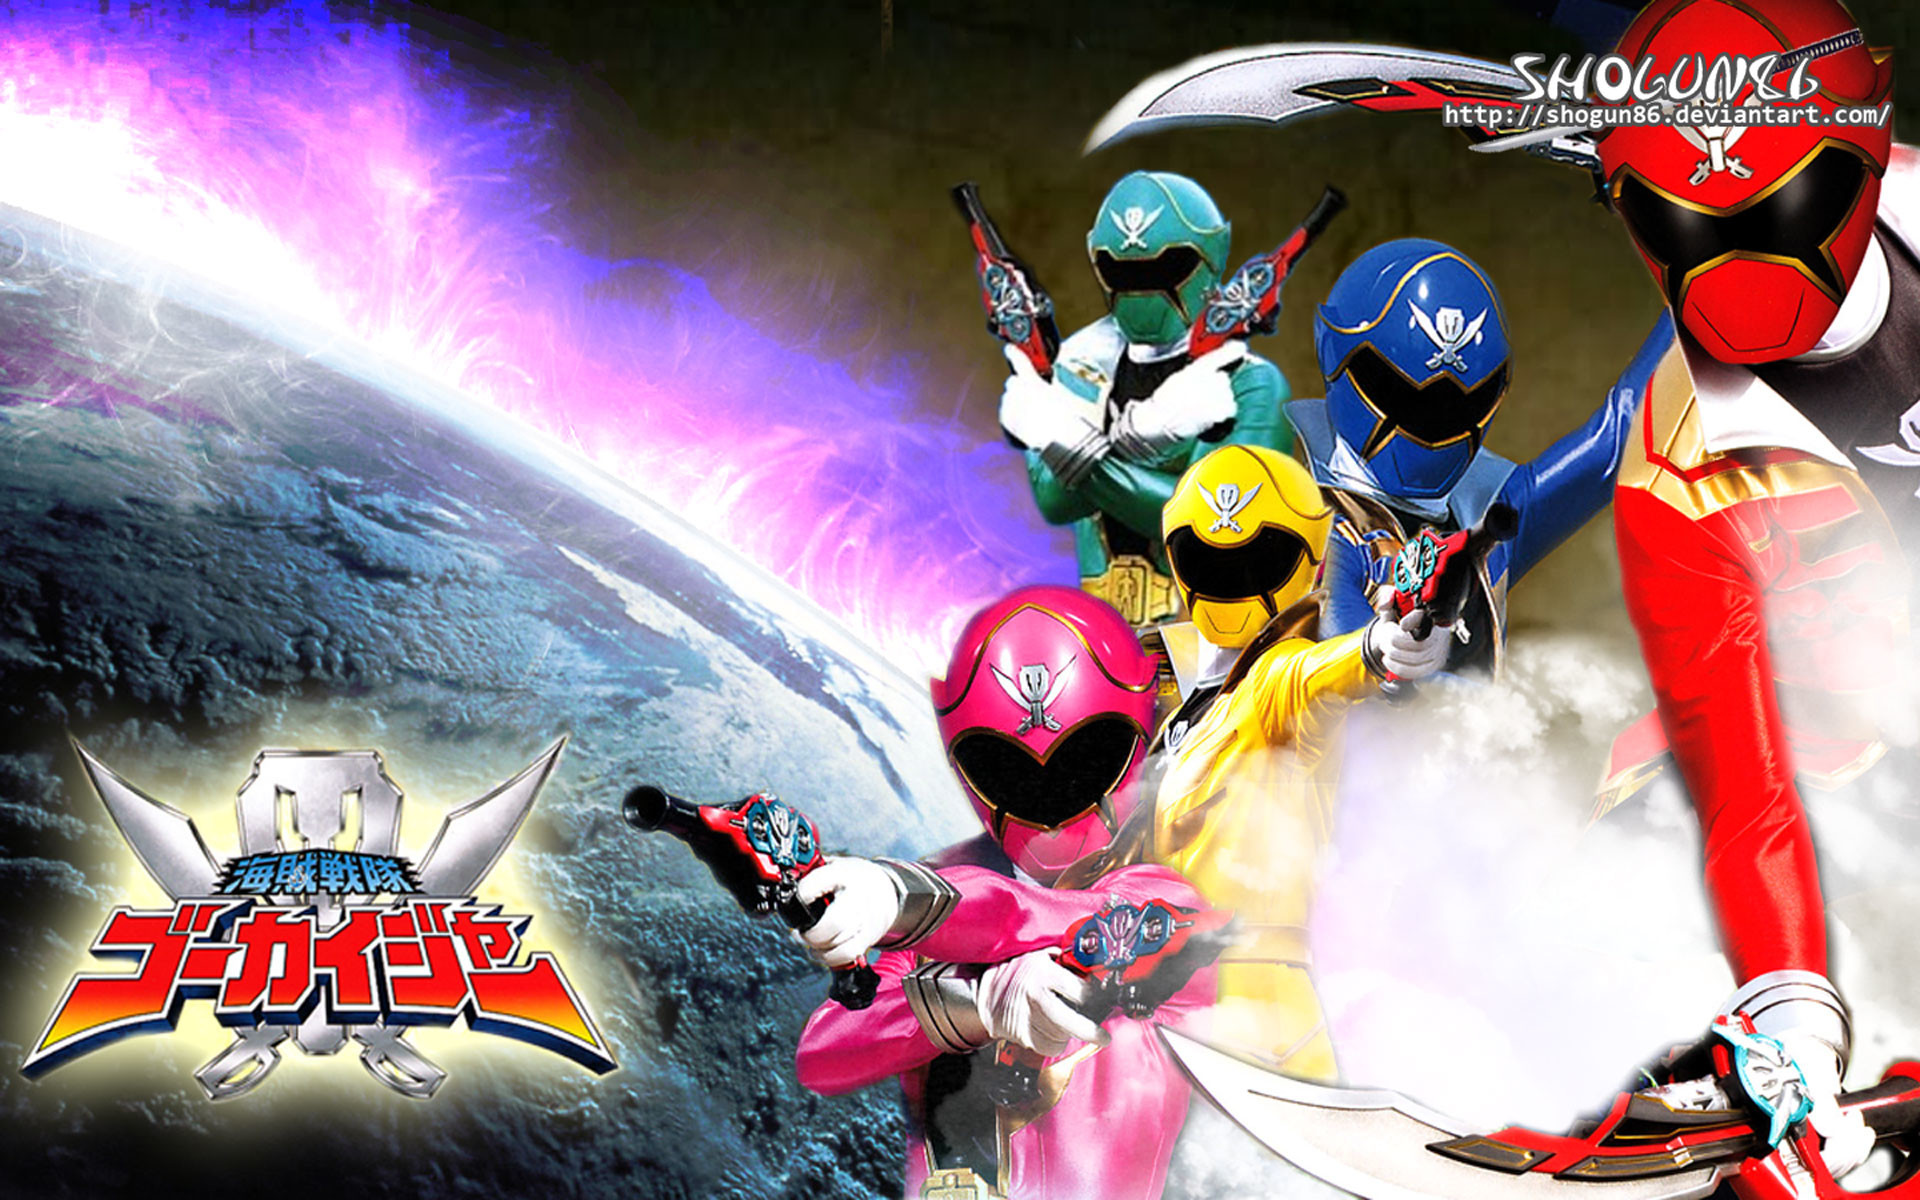 Gokaiger First Appearance All Red Sentai   Super Sentai / Power Rangers    Pinterest   Mighty morphin power rangers